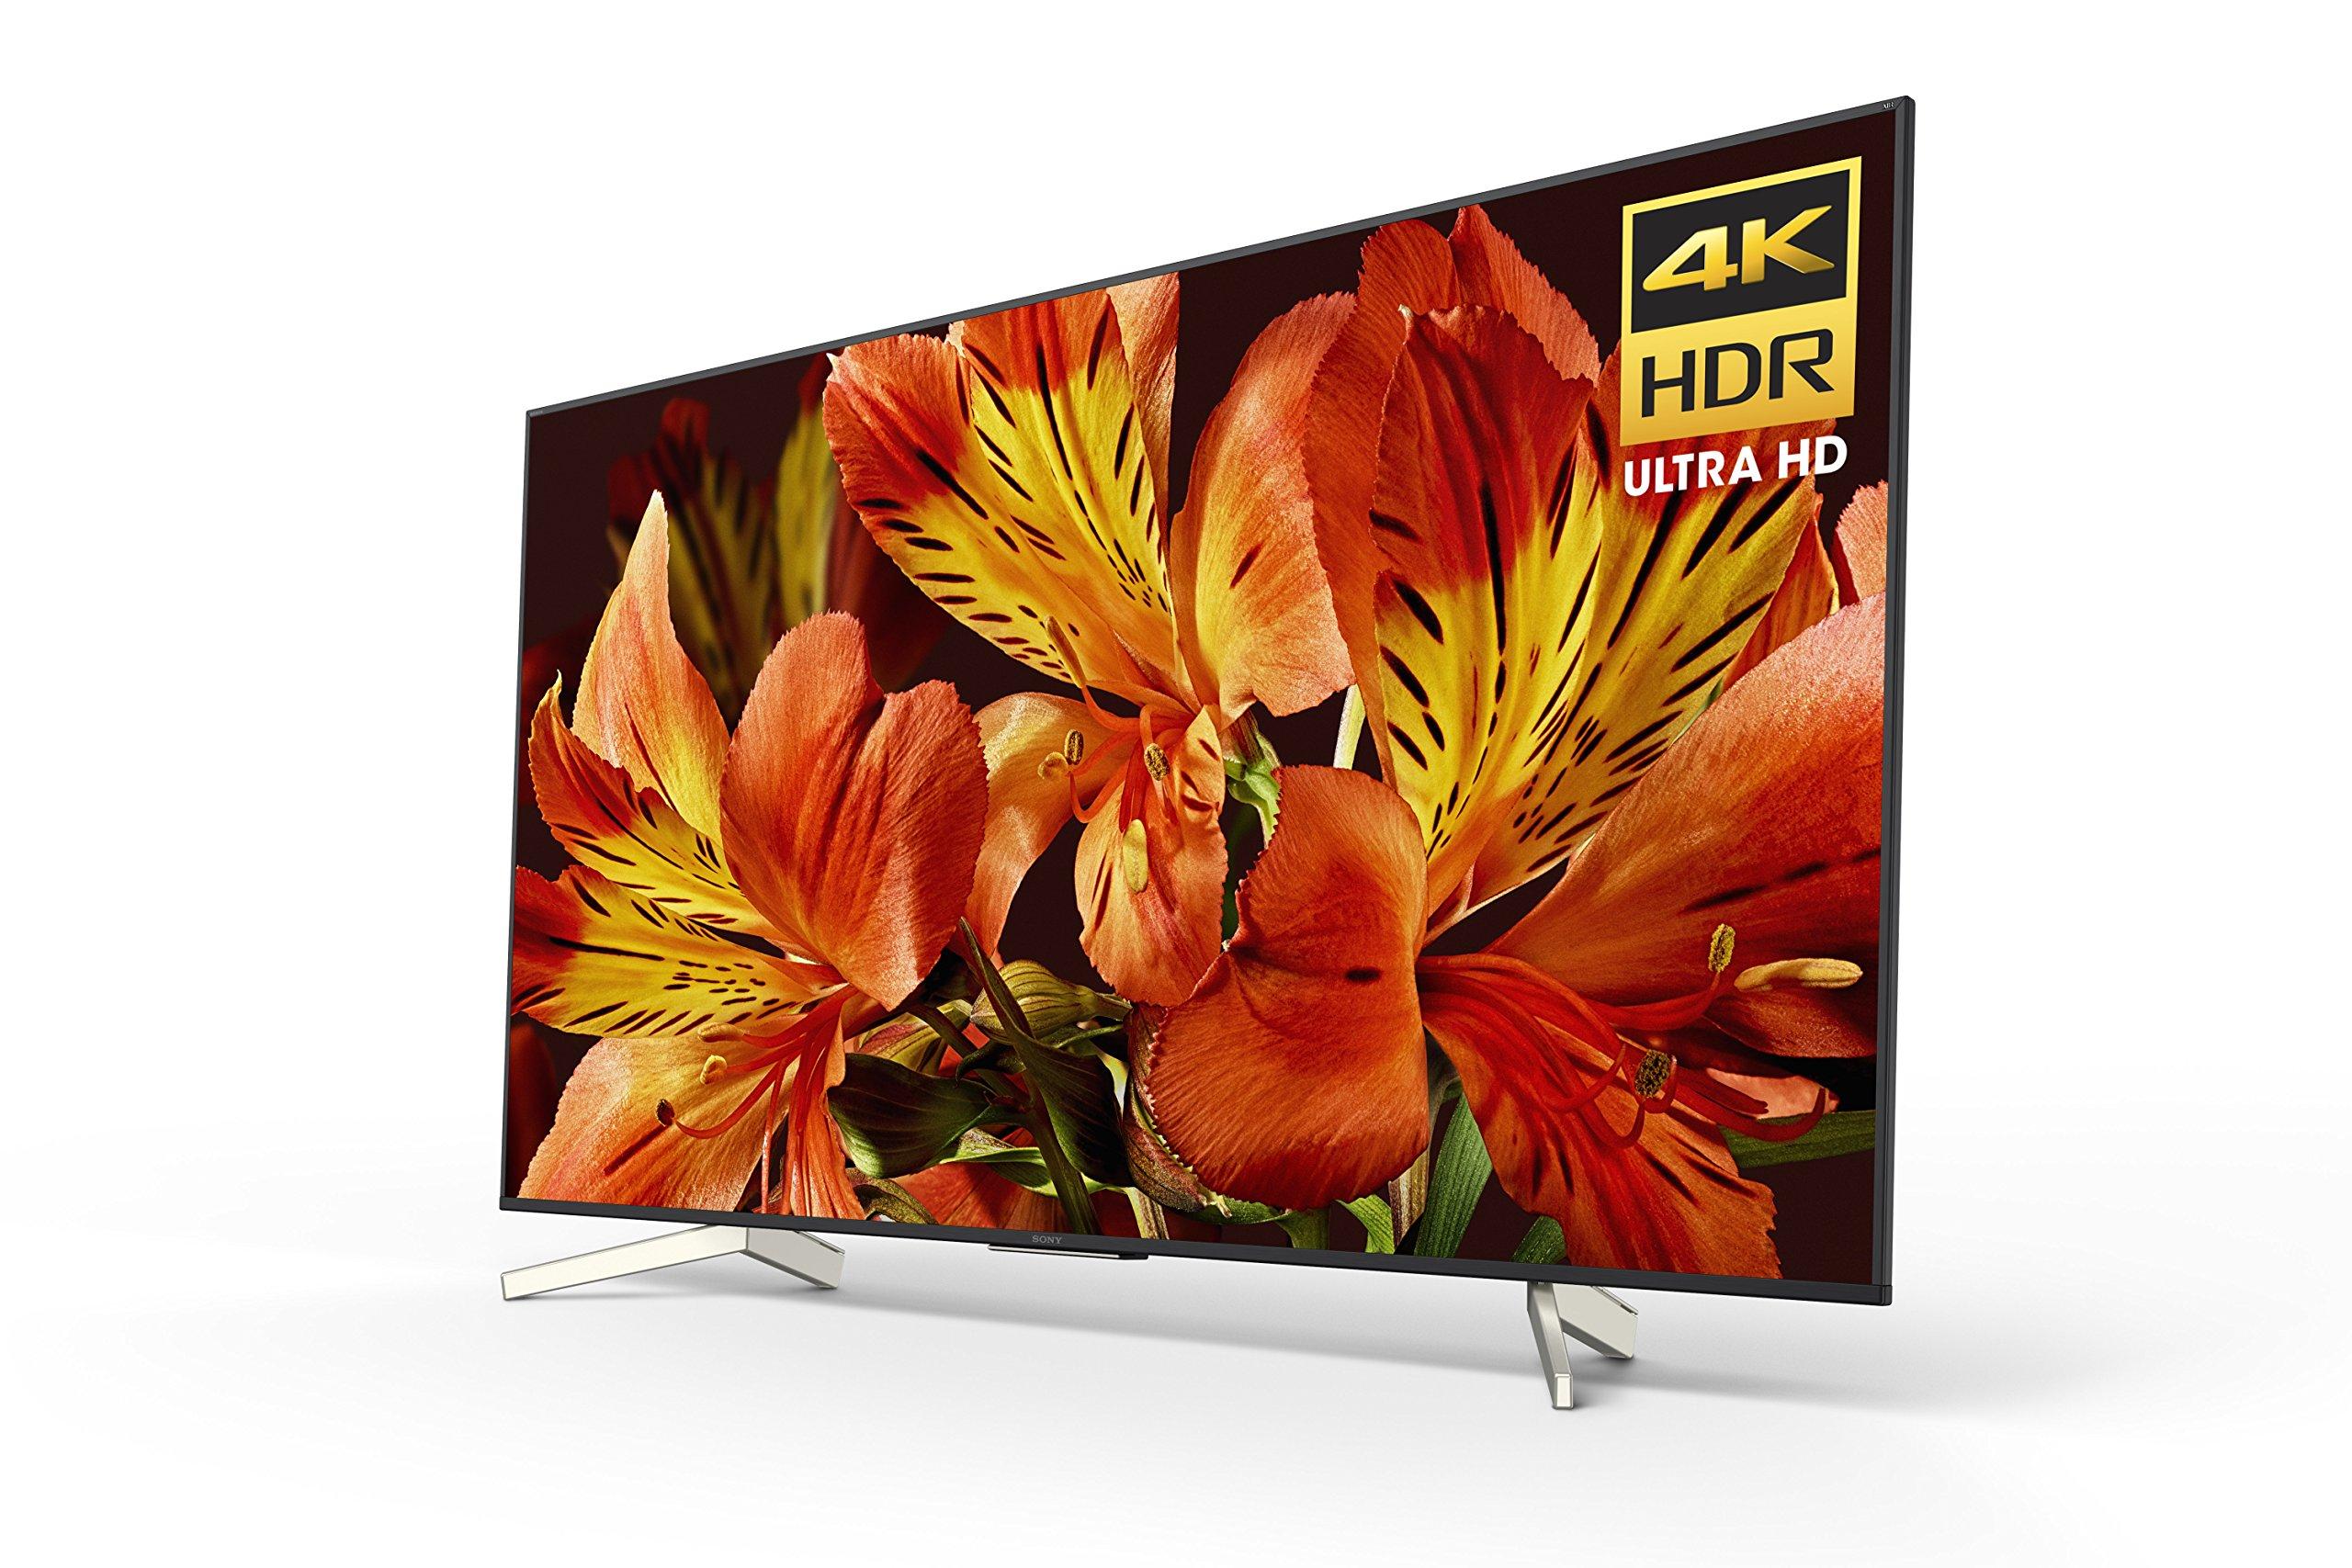 Sony XBR65X850F 4K Ultra HD Smart LED TV (2018 Model) 3